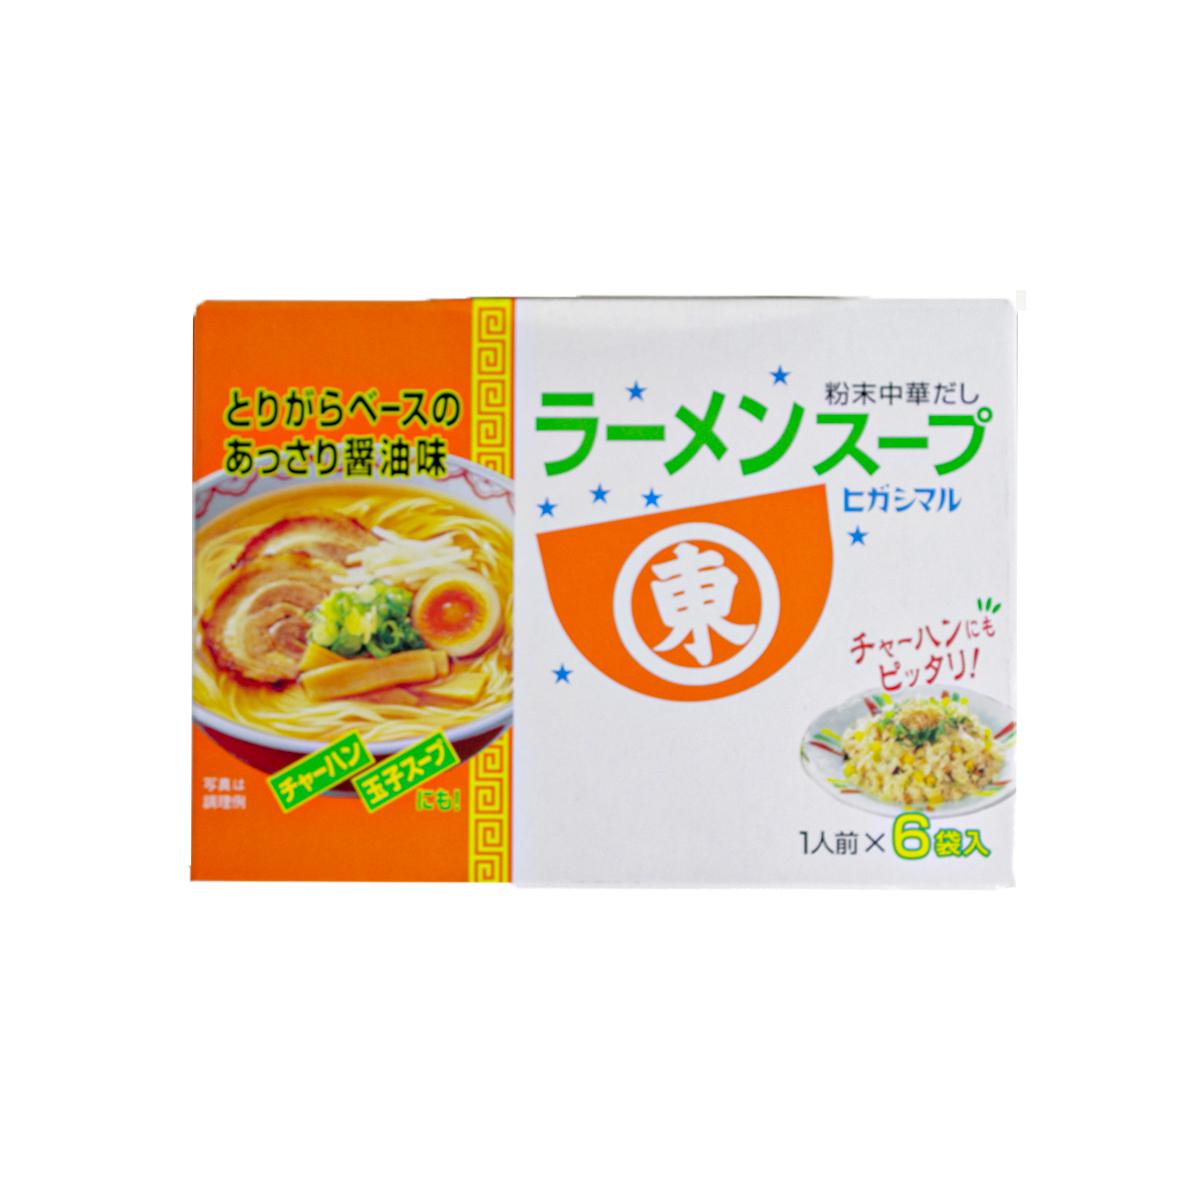 Tempero Pronto para Caldo Sopa de Lamen Higashimaru – 54g